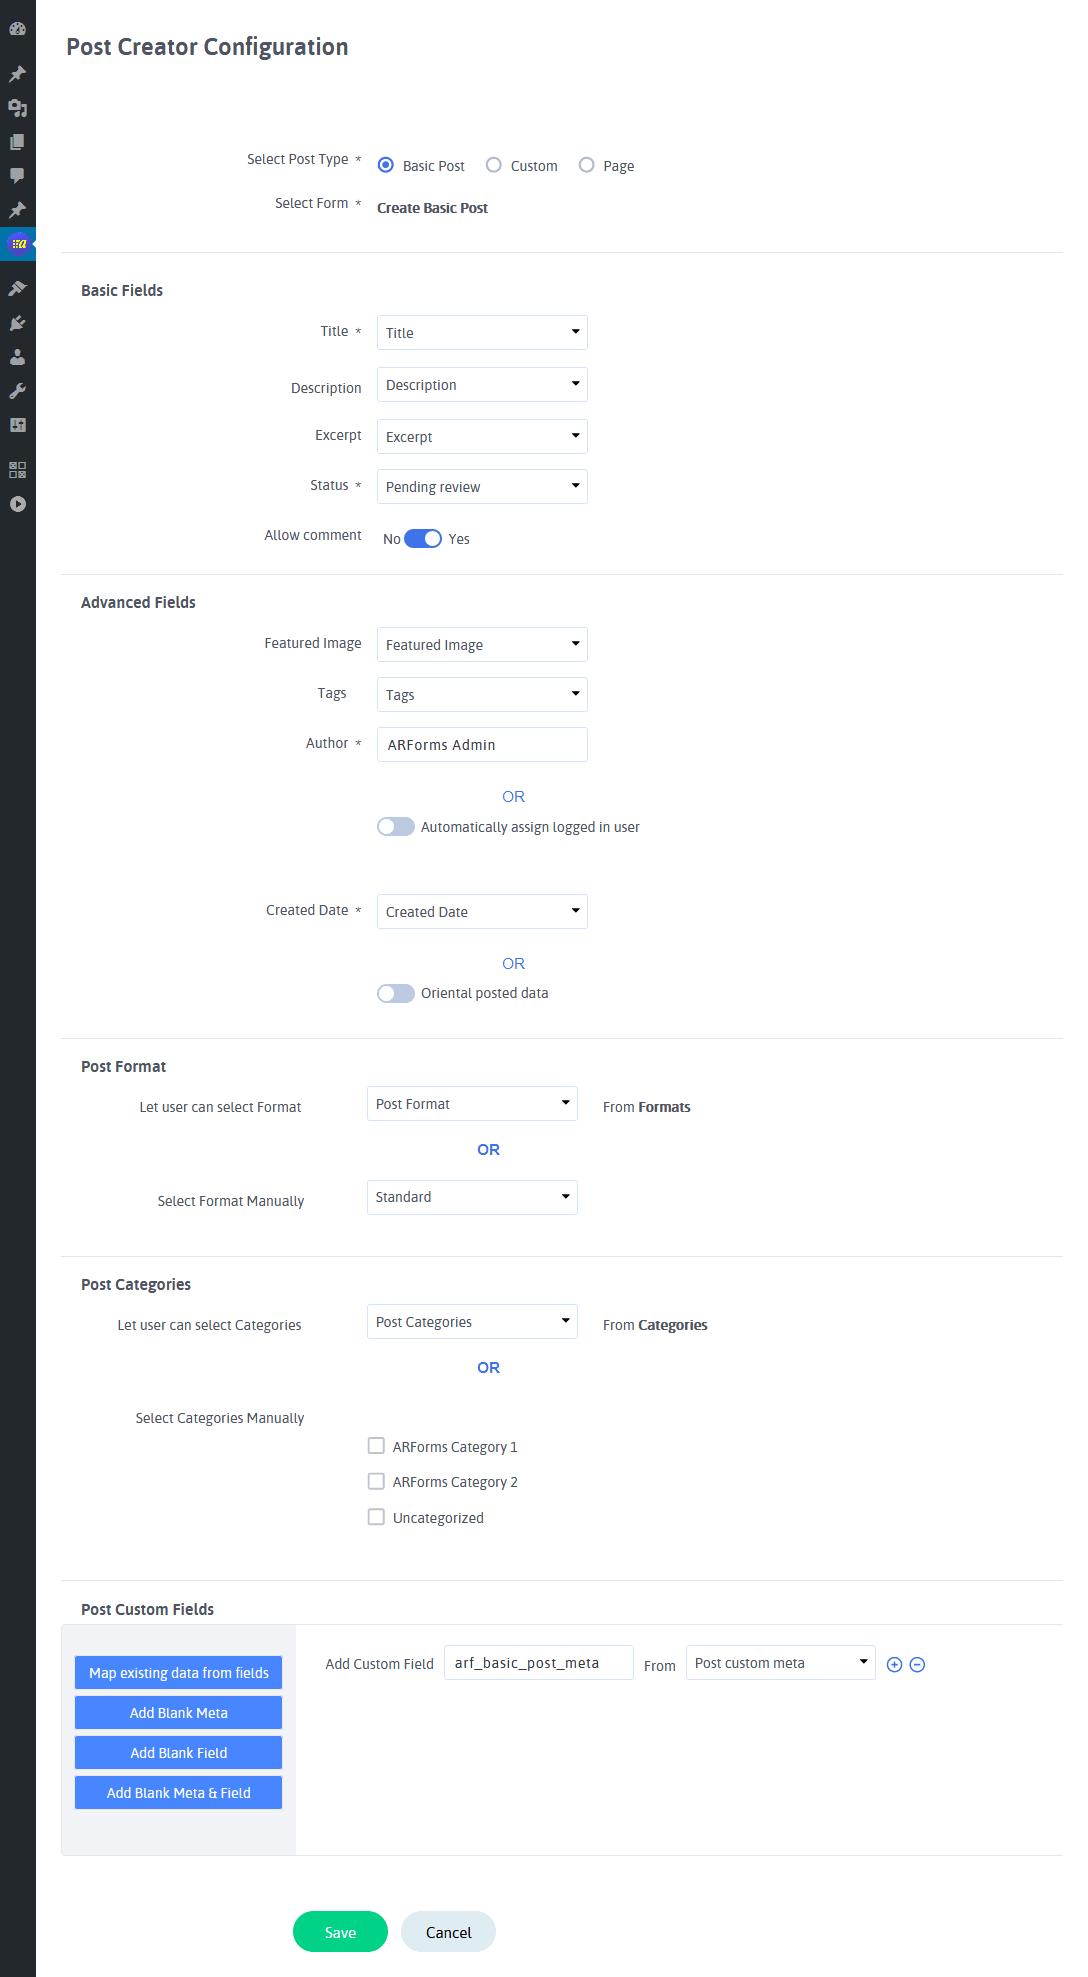 ARForms Post Creator - Configure Post Creator Forms (Standard Post)